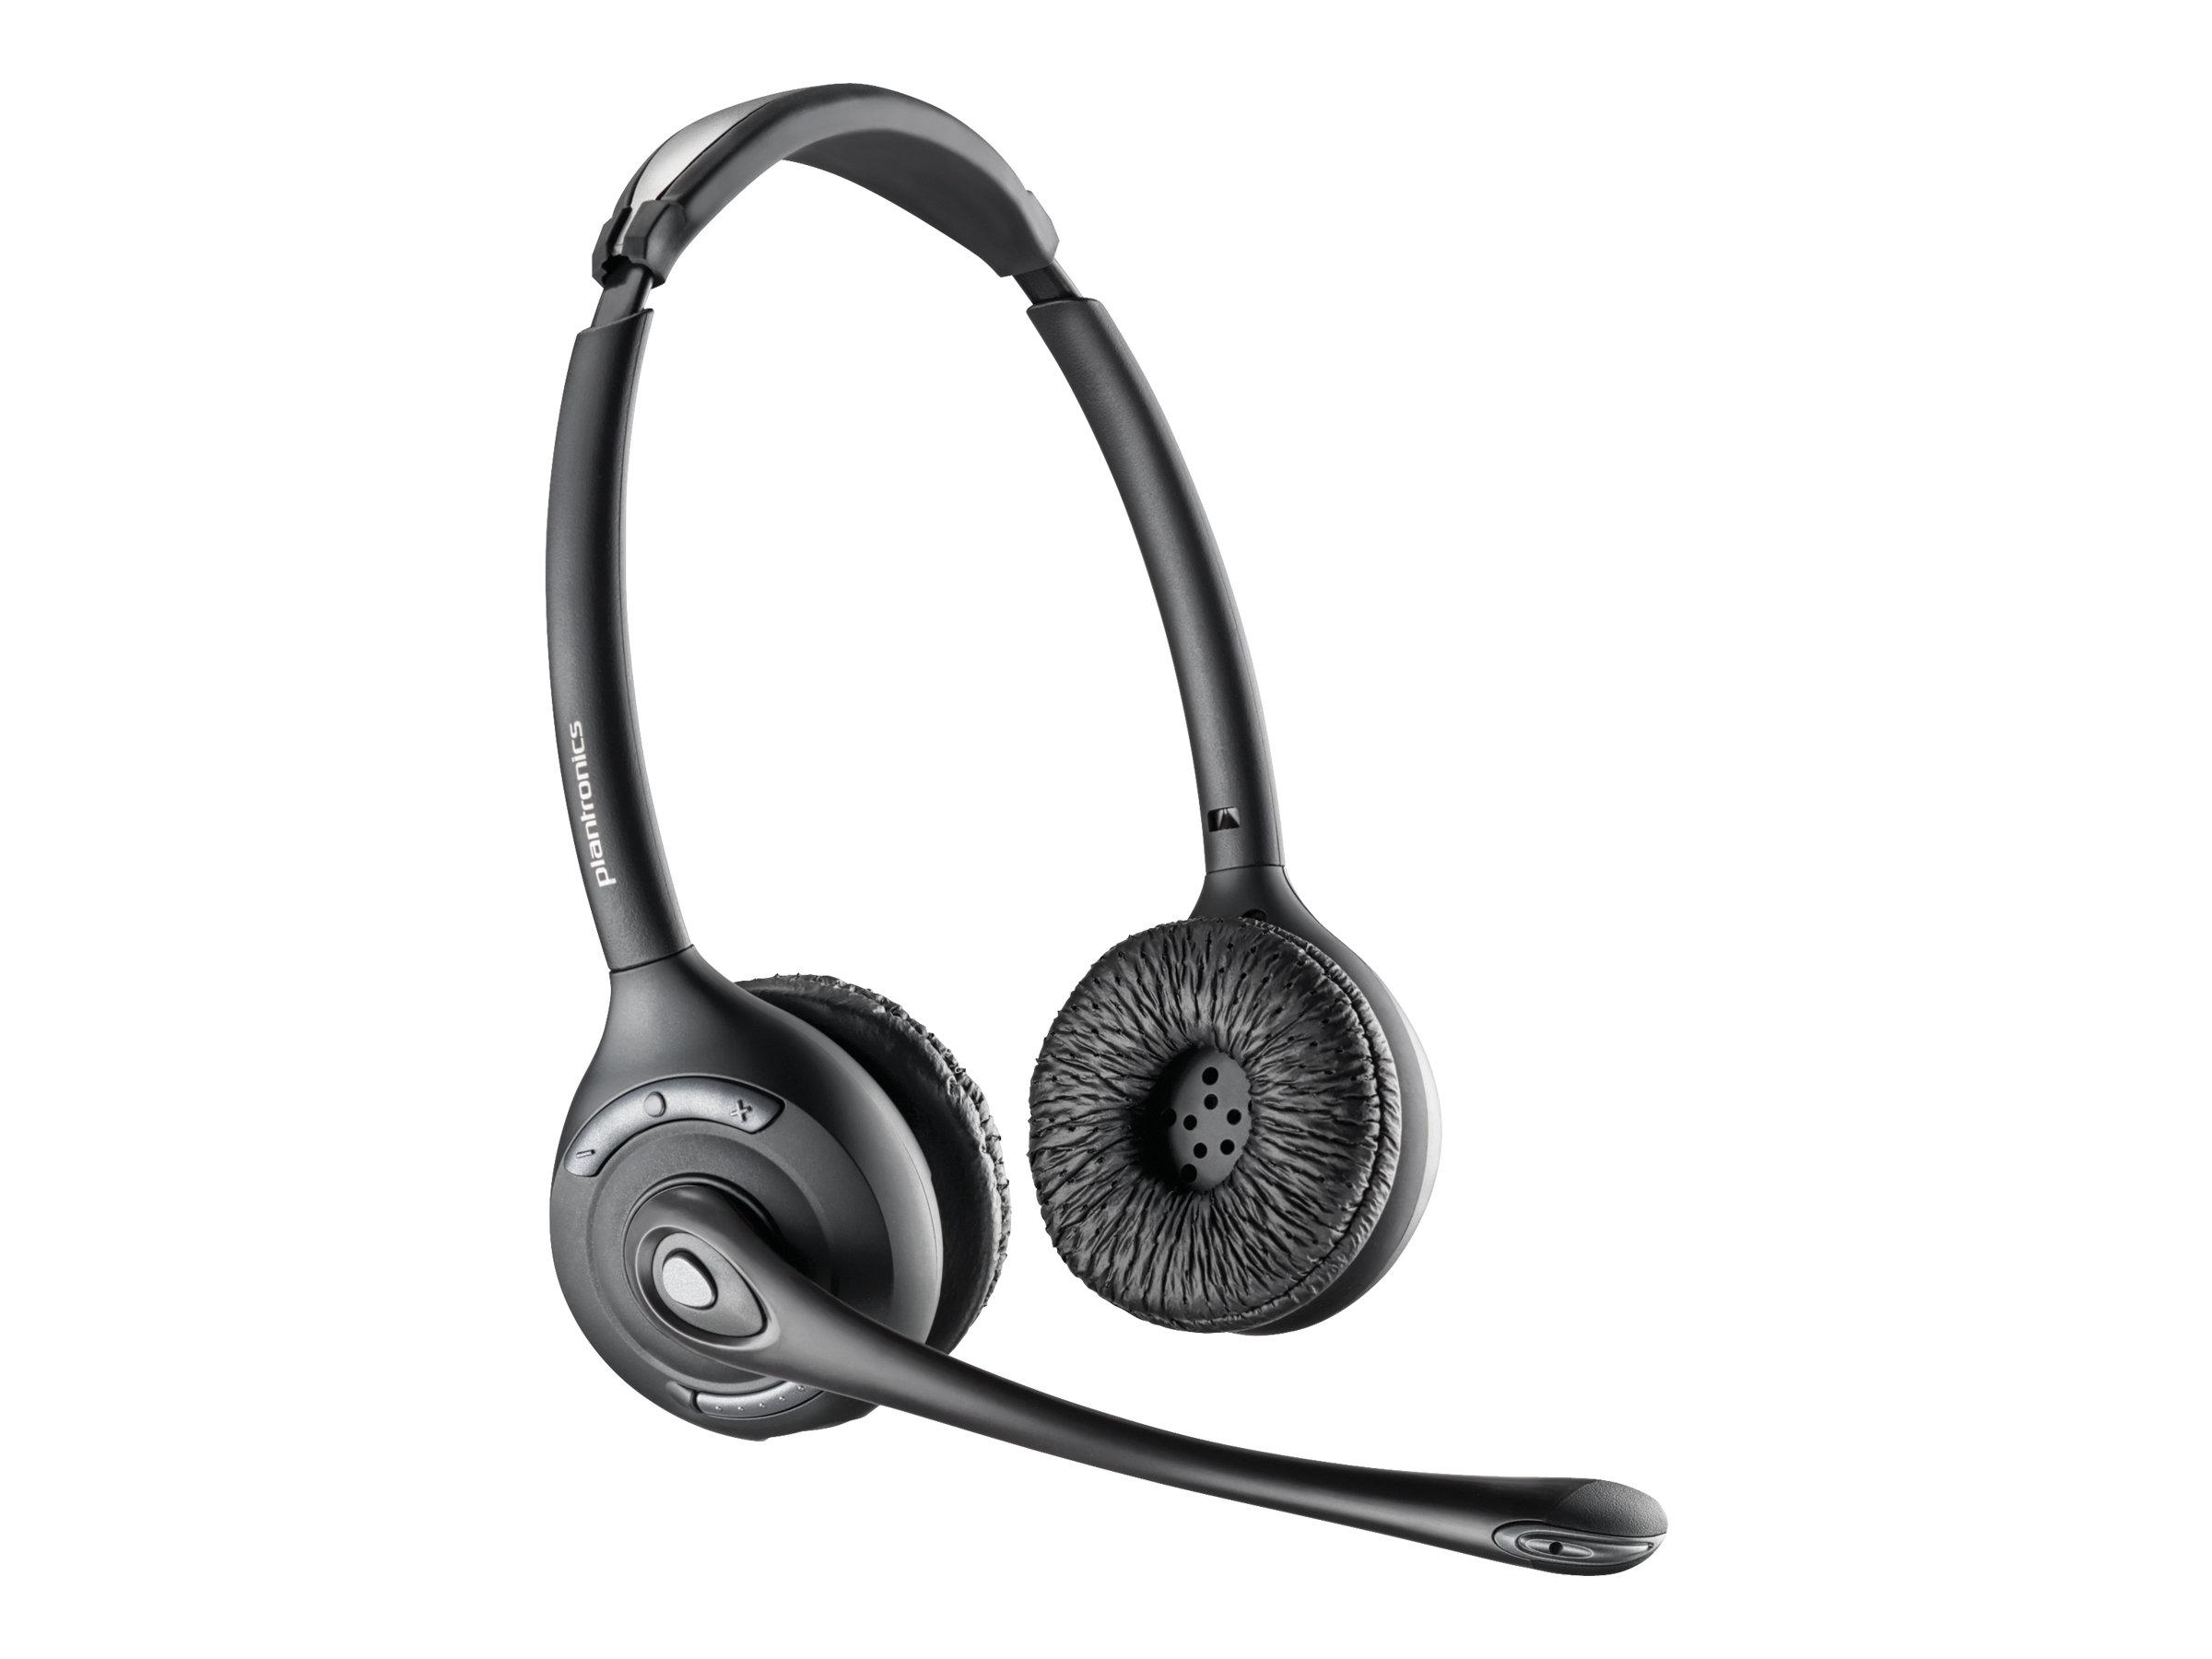 6aff6fbefe0 Image for Plantronics Savi W720 - 700 Series - headset - on-ear - wireless